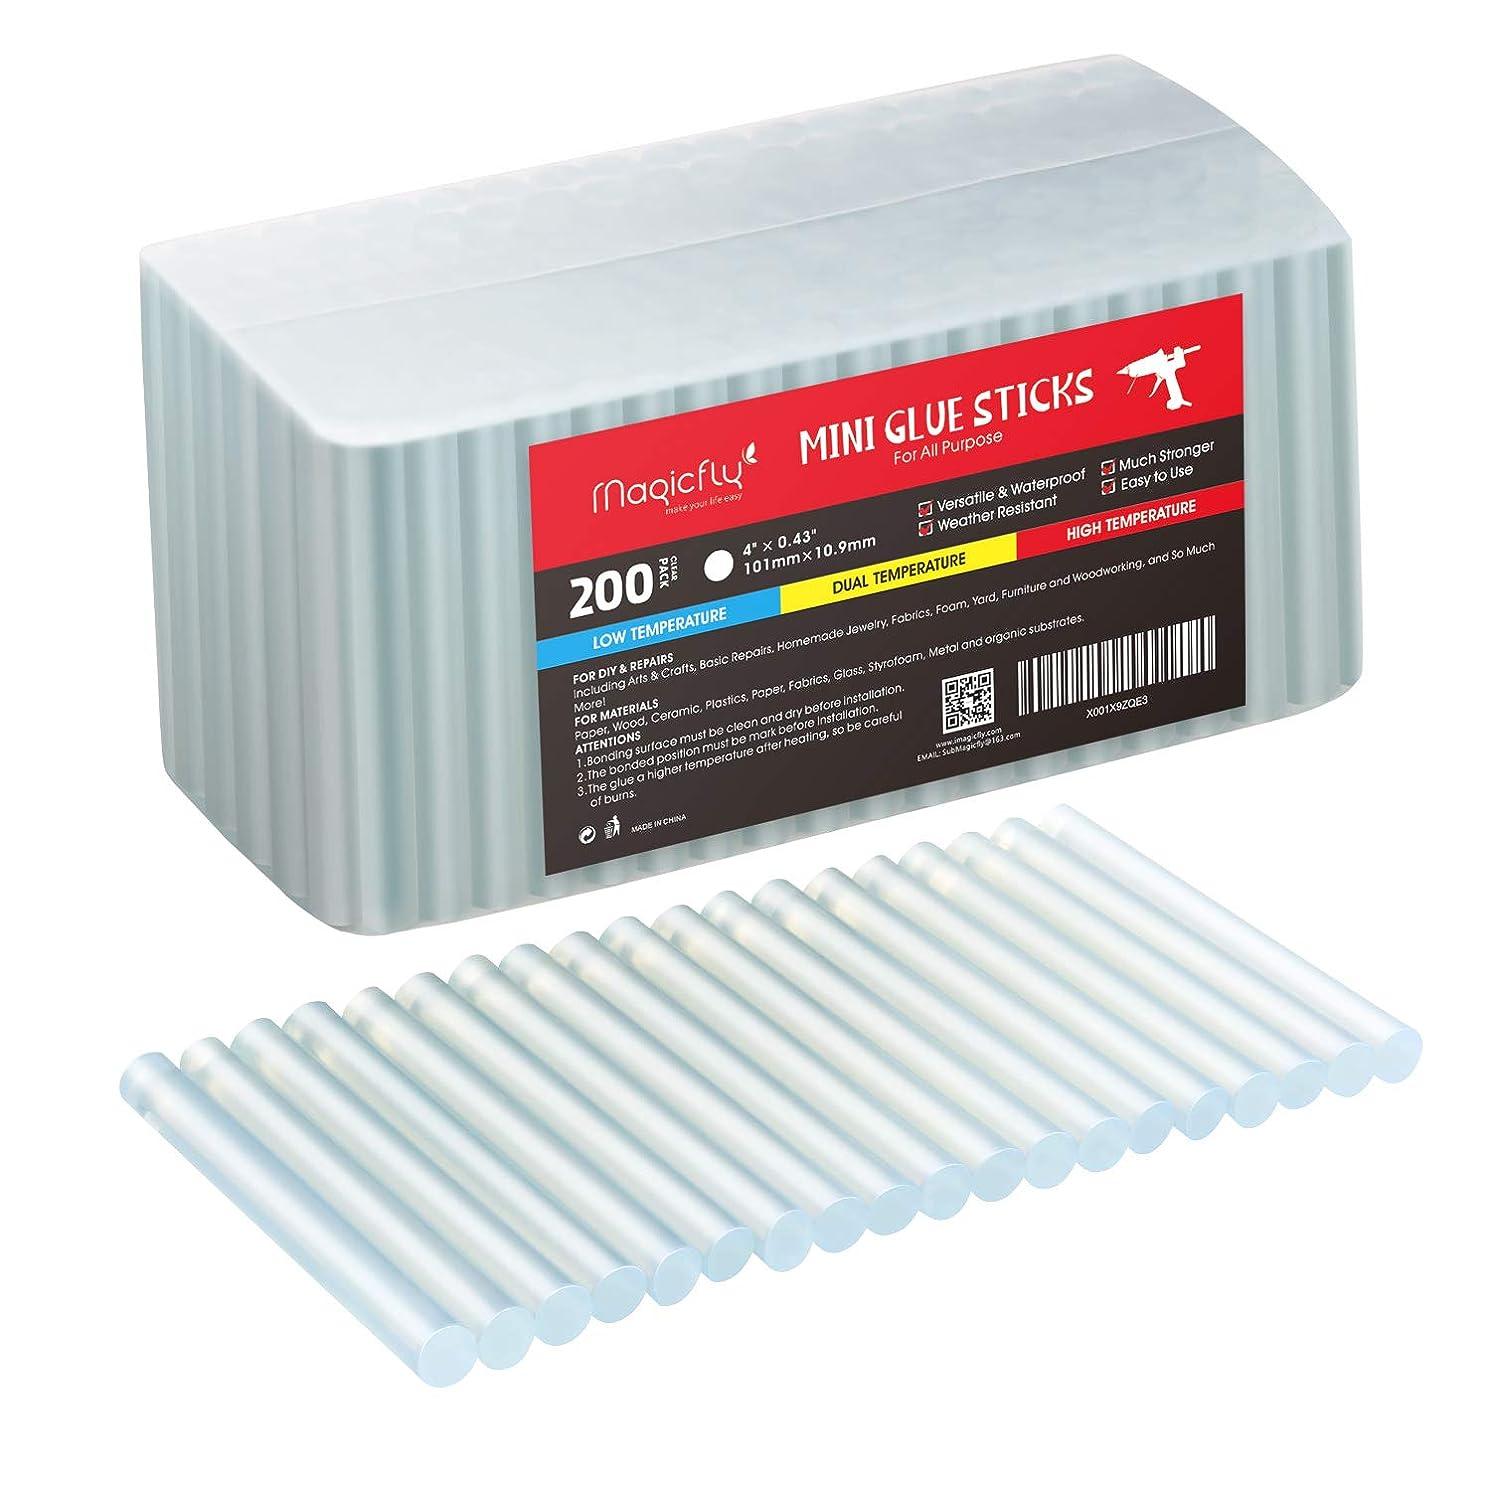 200-Pack Full Size Hot Glue Sticks, Magicfly 4